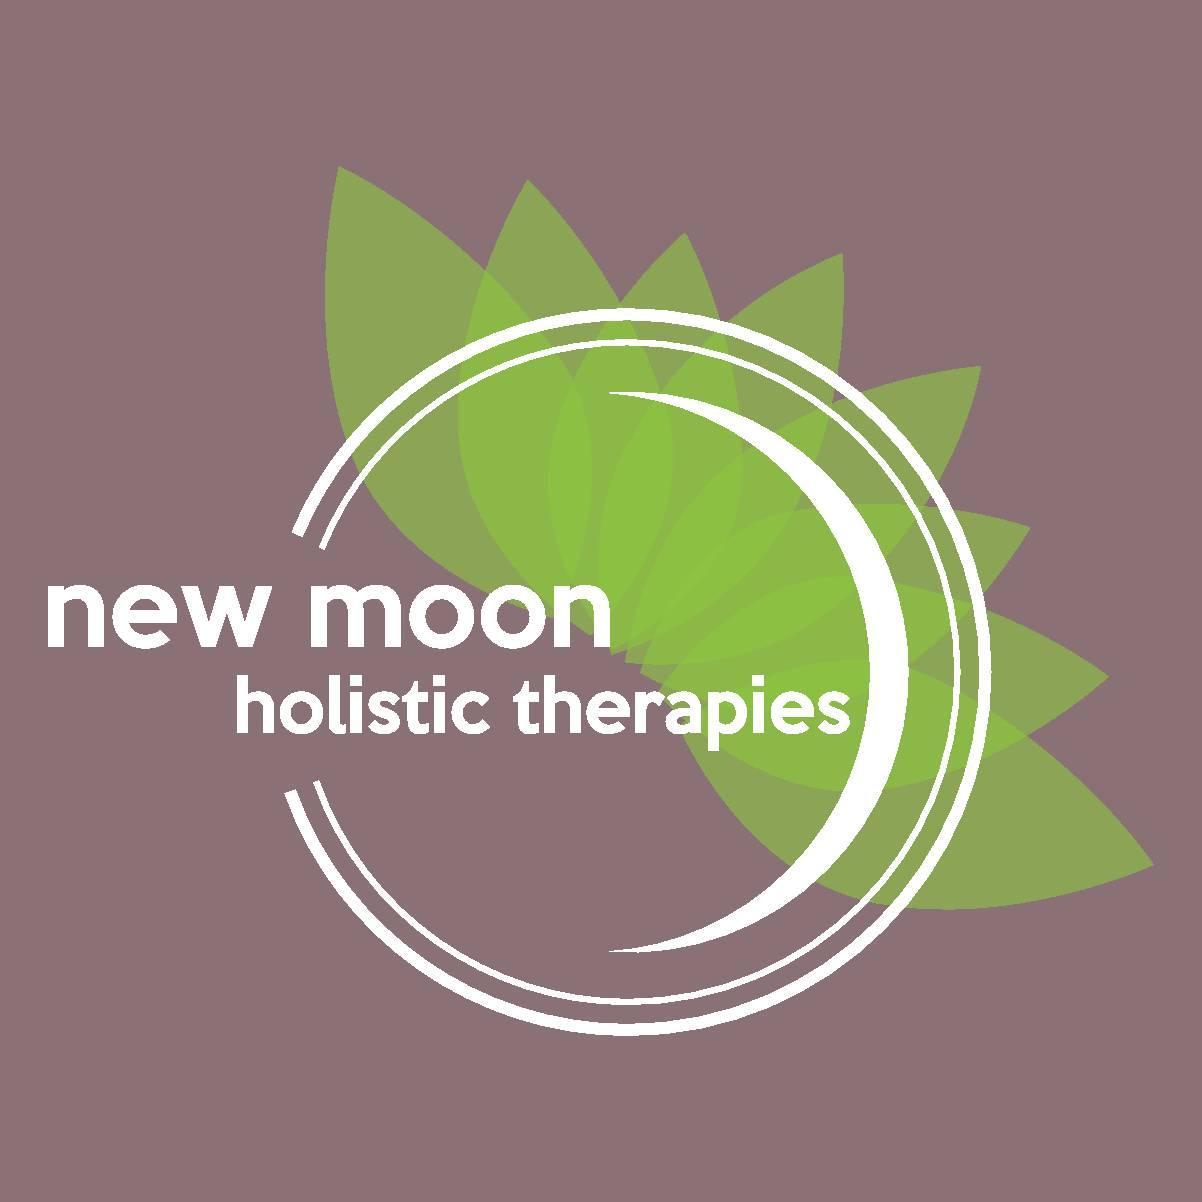 New Moon Holistic Therapies - Nottingham, Nottinghamshire NG15 9BA - 01623 467216 | ShowMeLocal.com